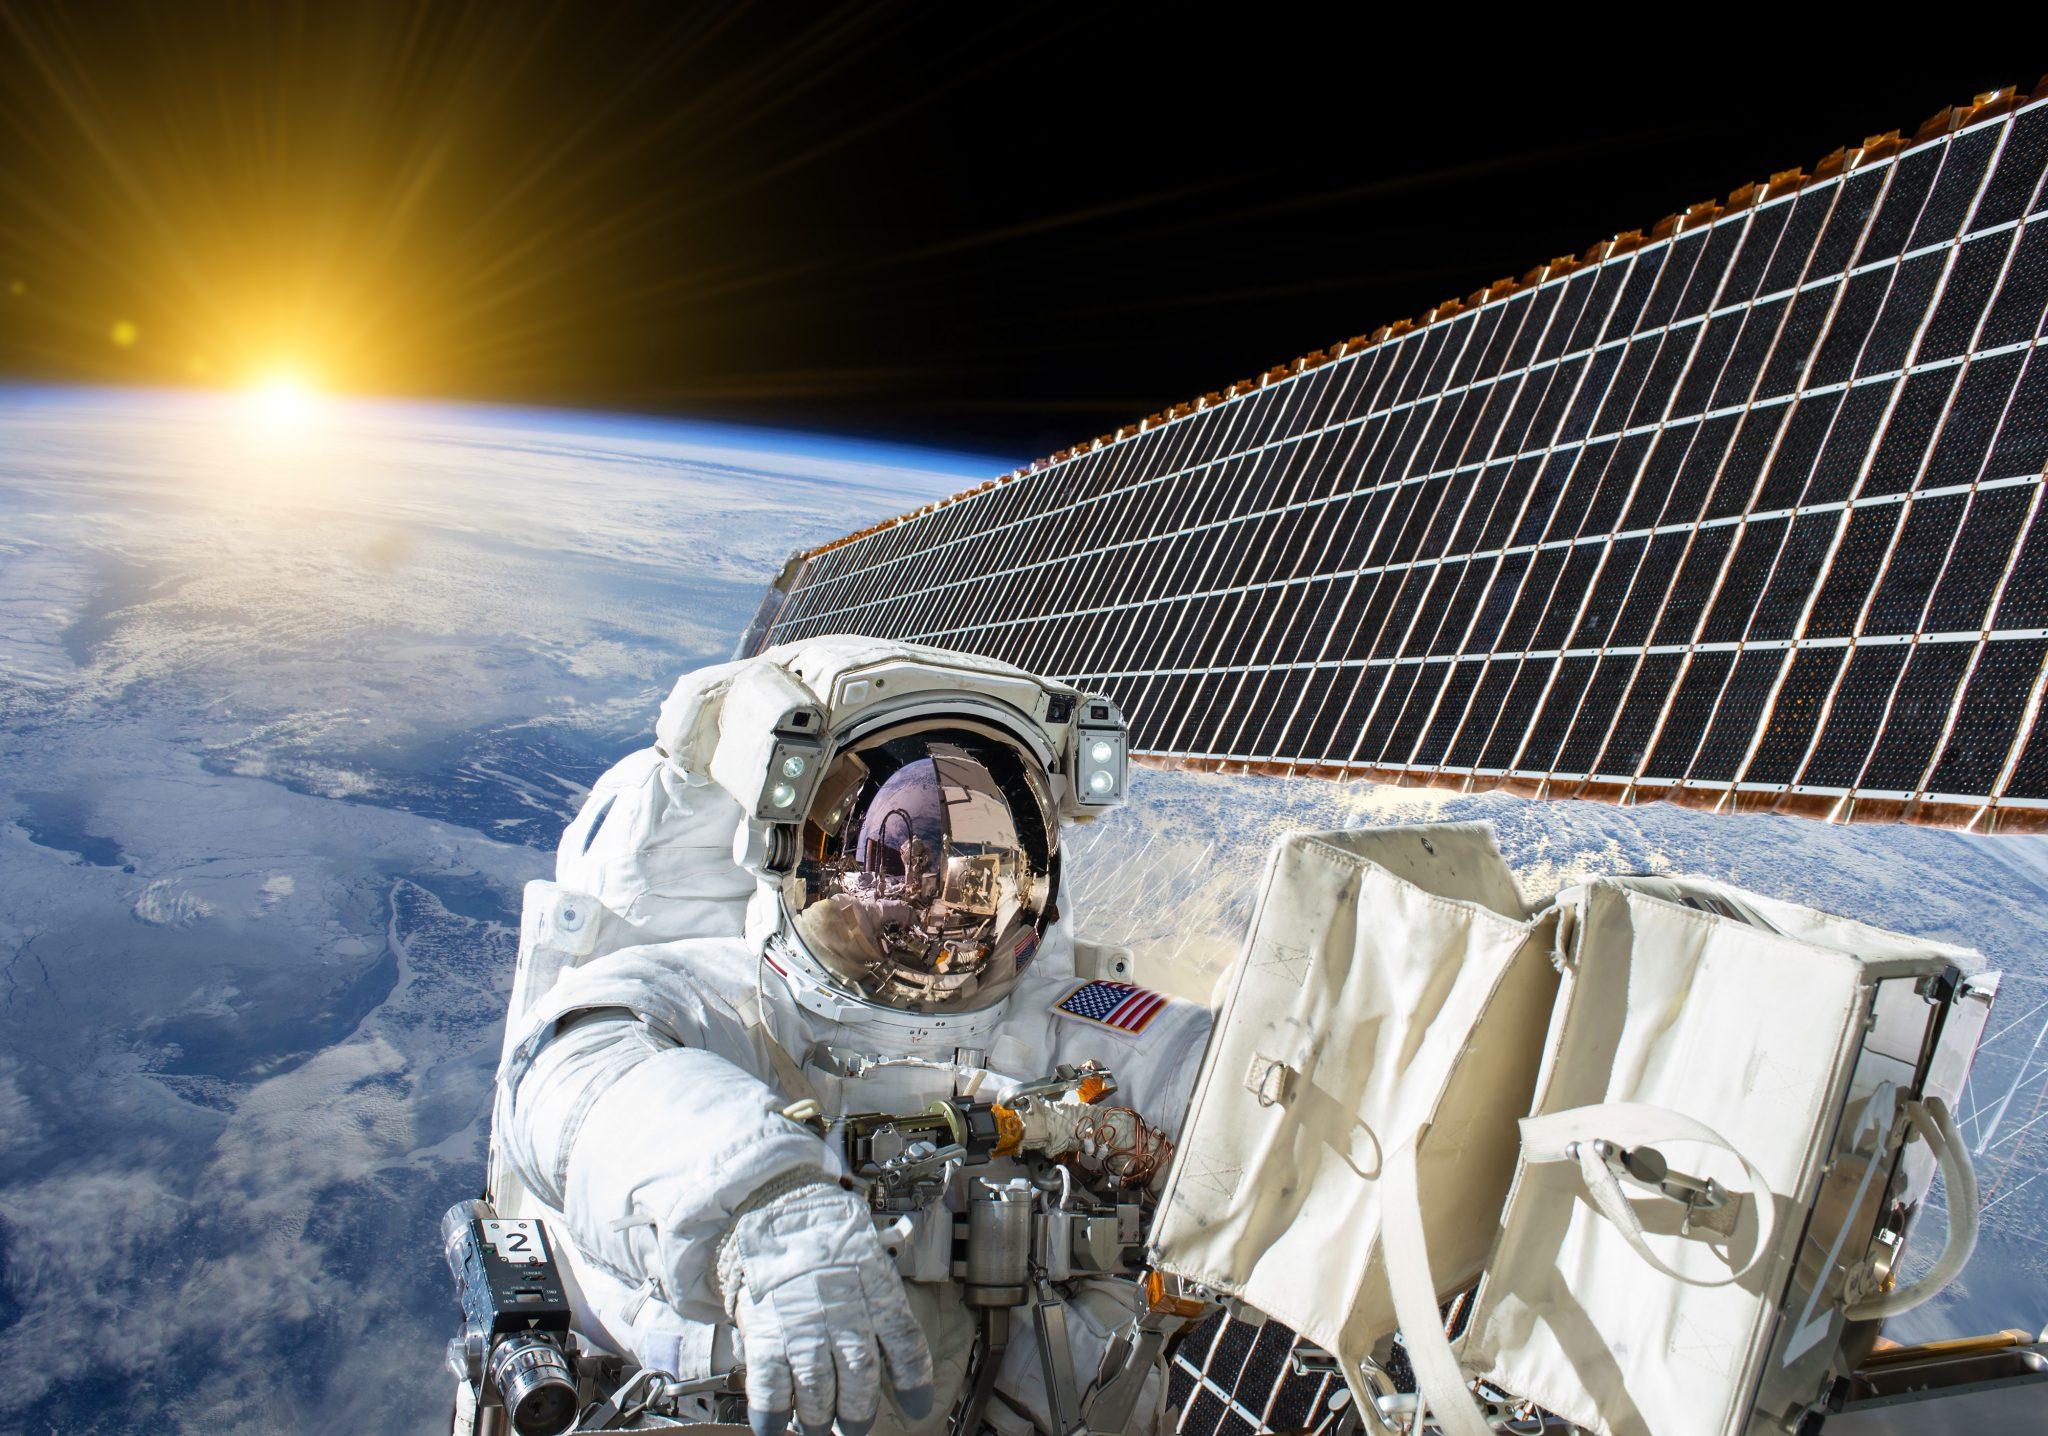 Two Americans to Make First All-Female NASA Spacewalk